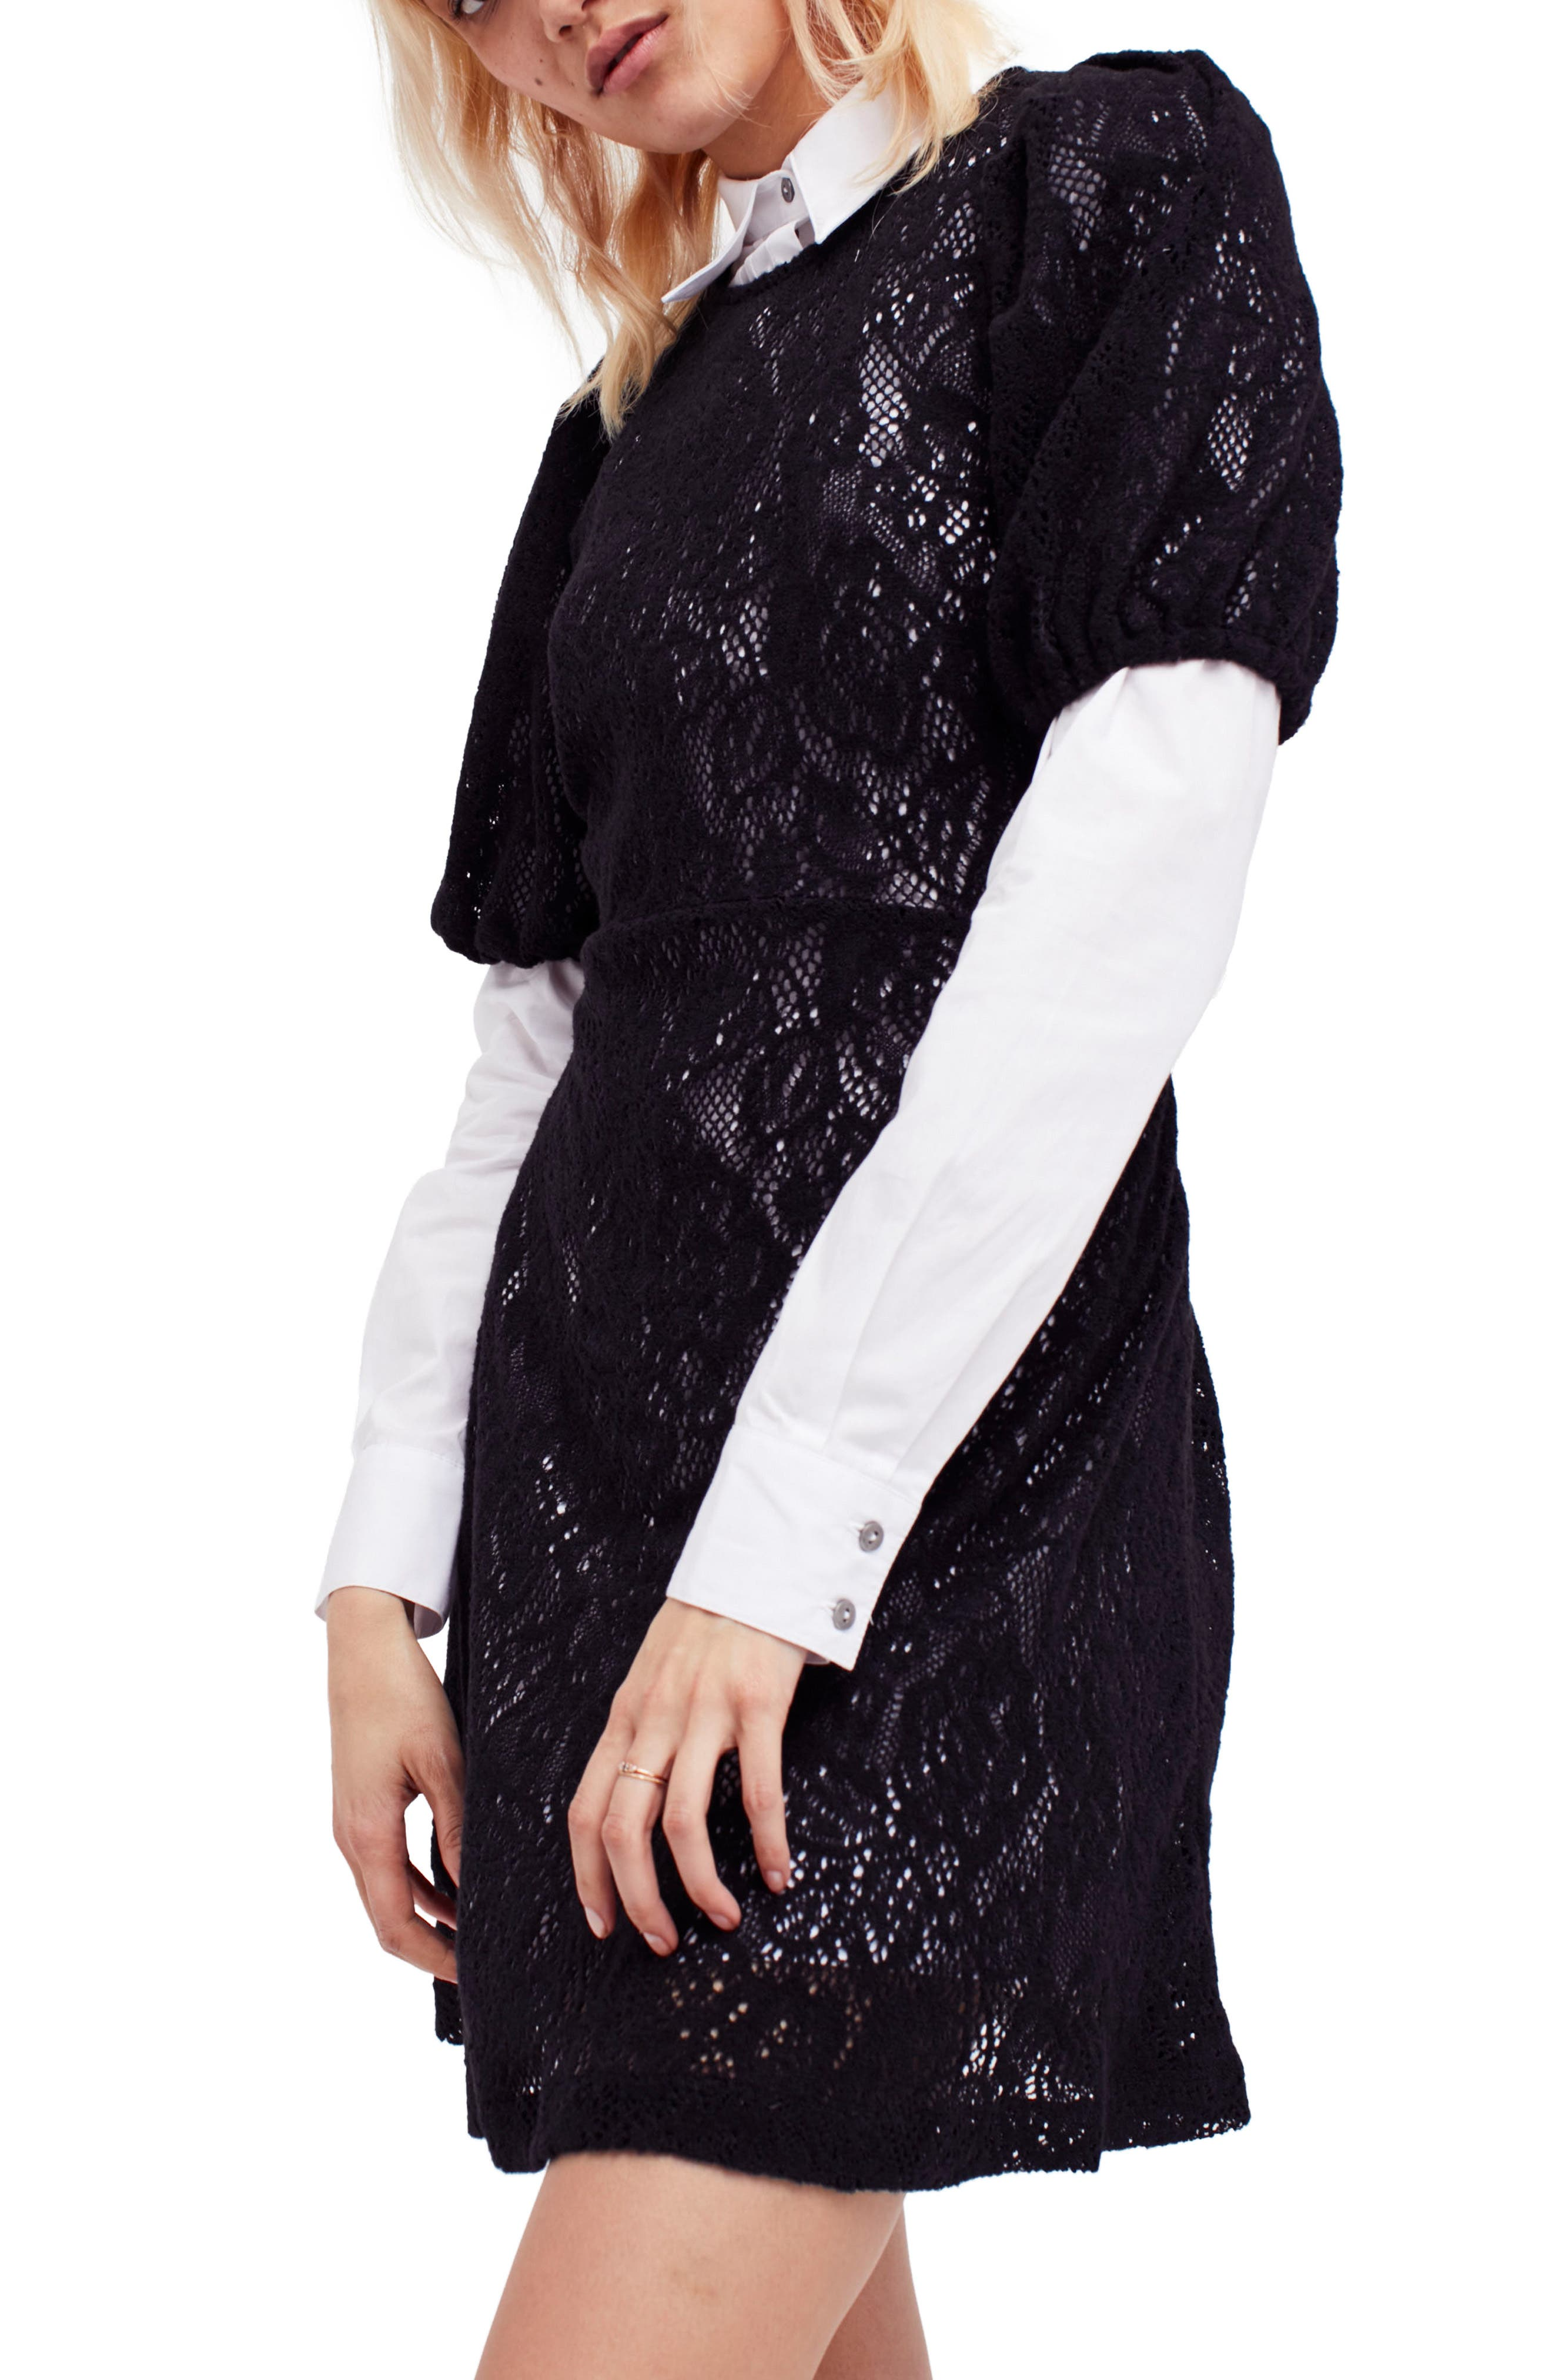 Main Image - Free People Pretty Princess Dress Shirtdress with Lace Overlay